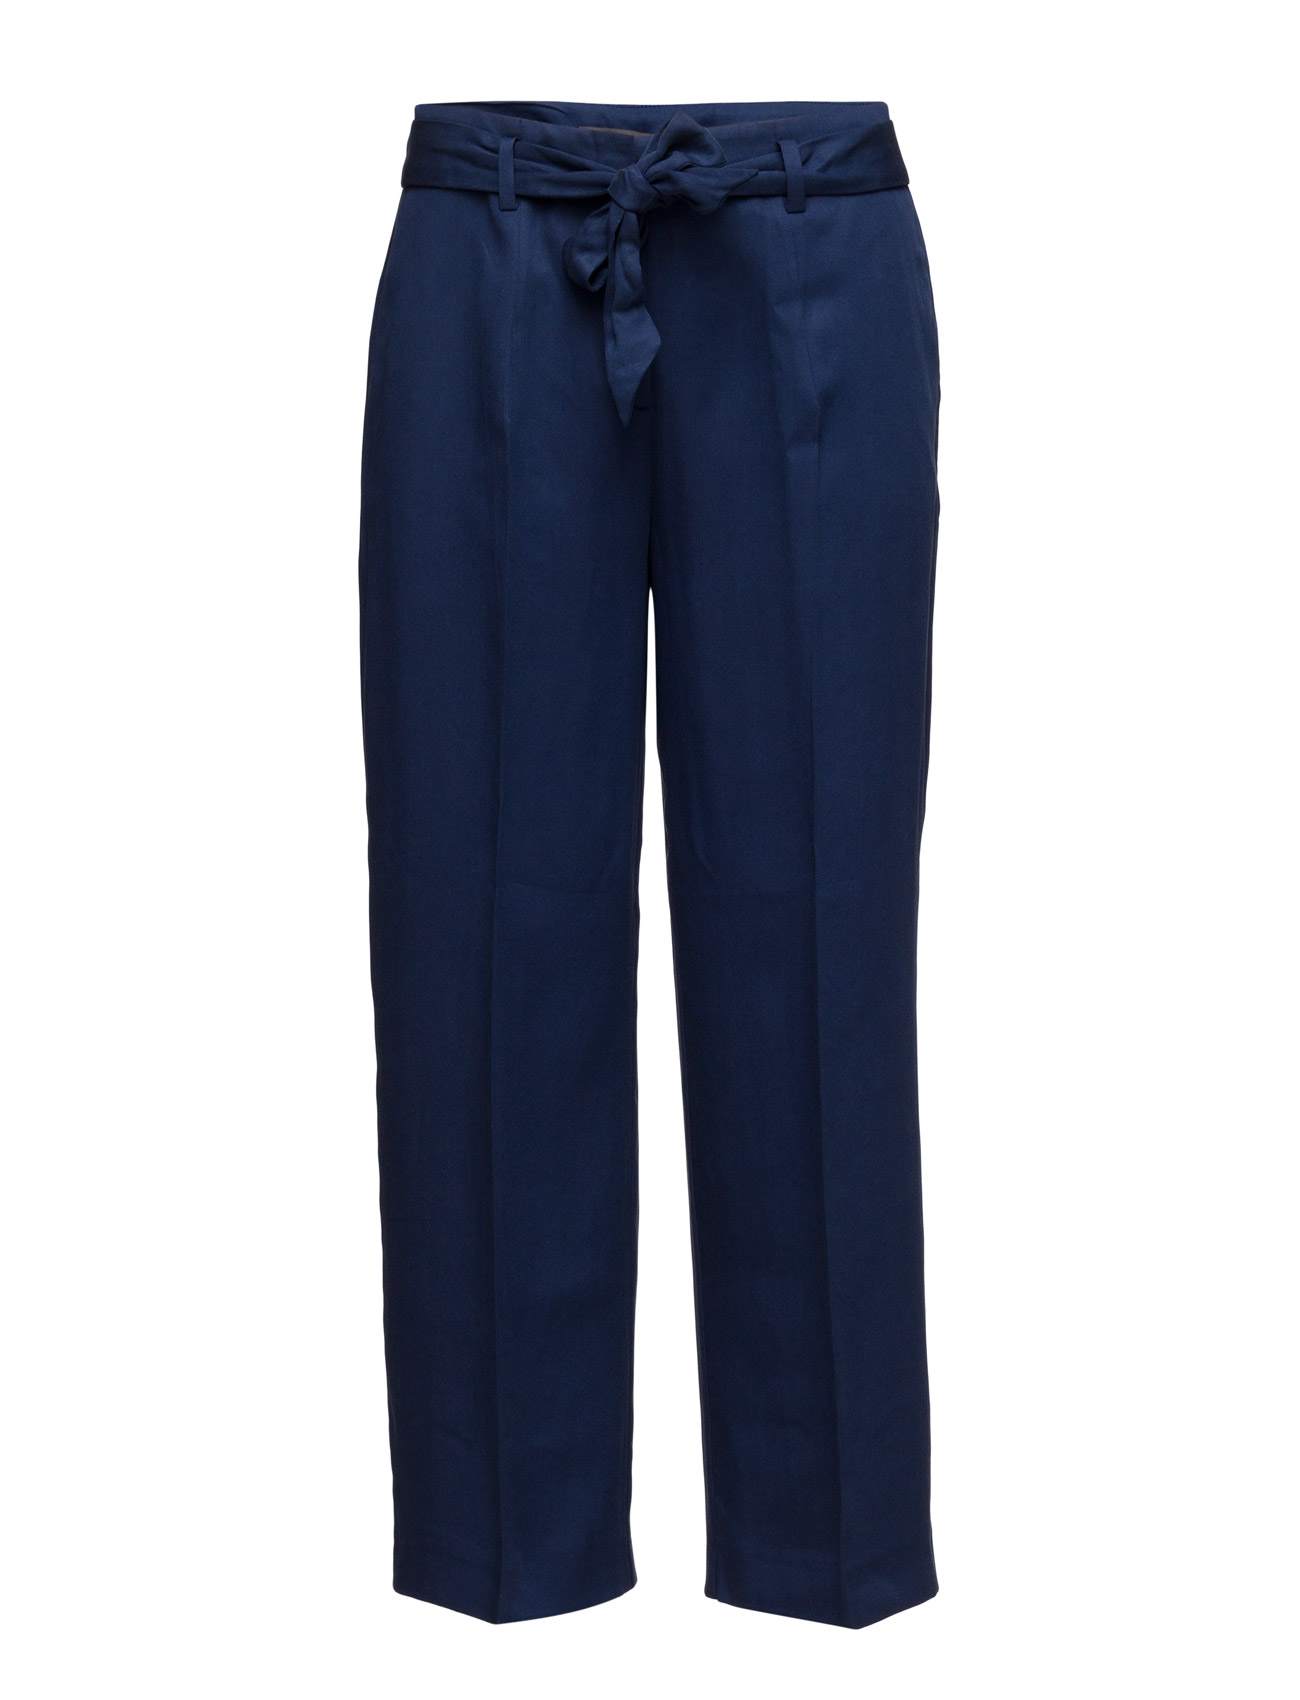 Pants Woven Esprit Collection Trompetbukser til Damer i Navy blå